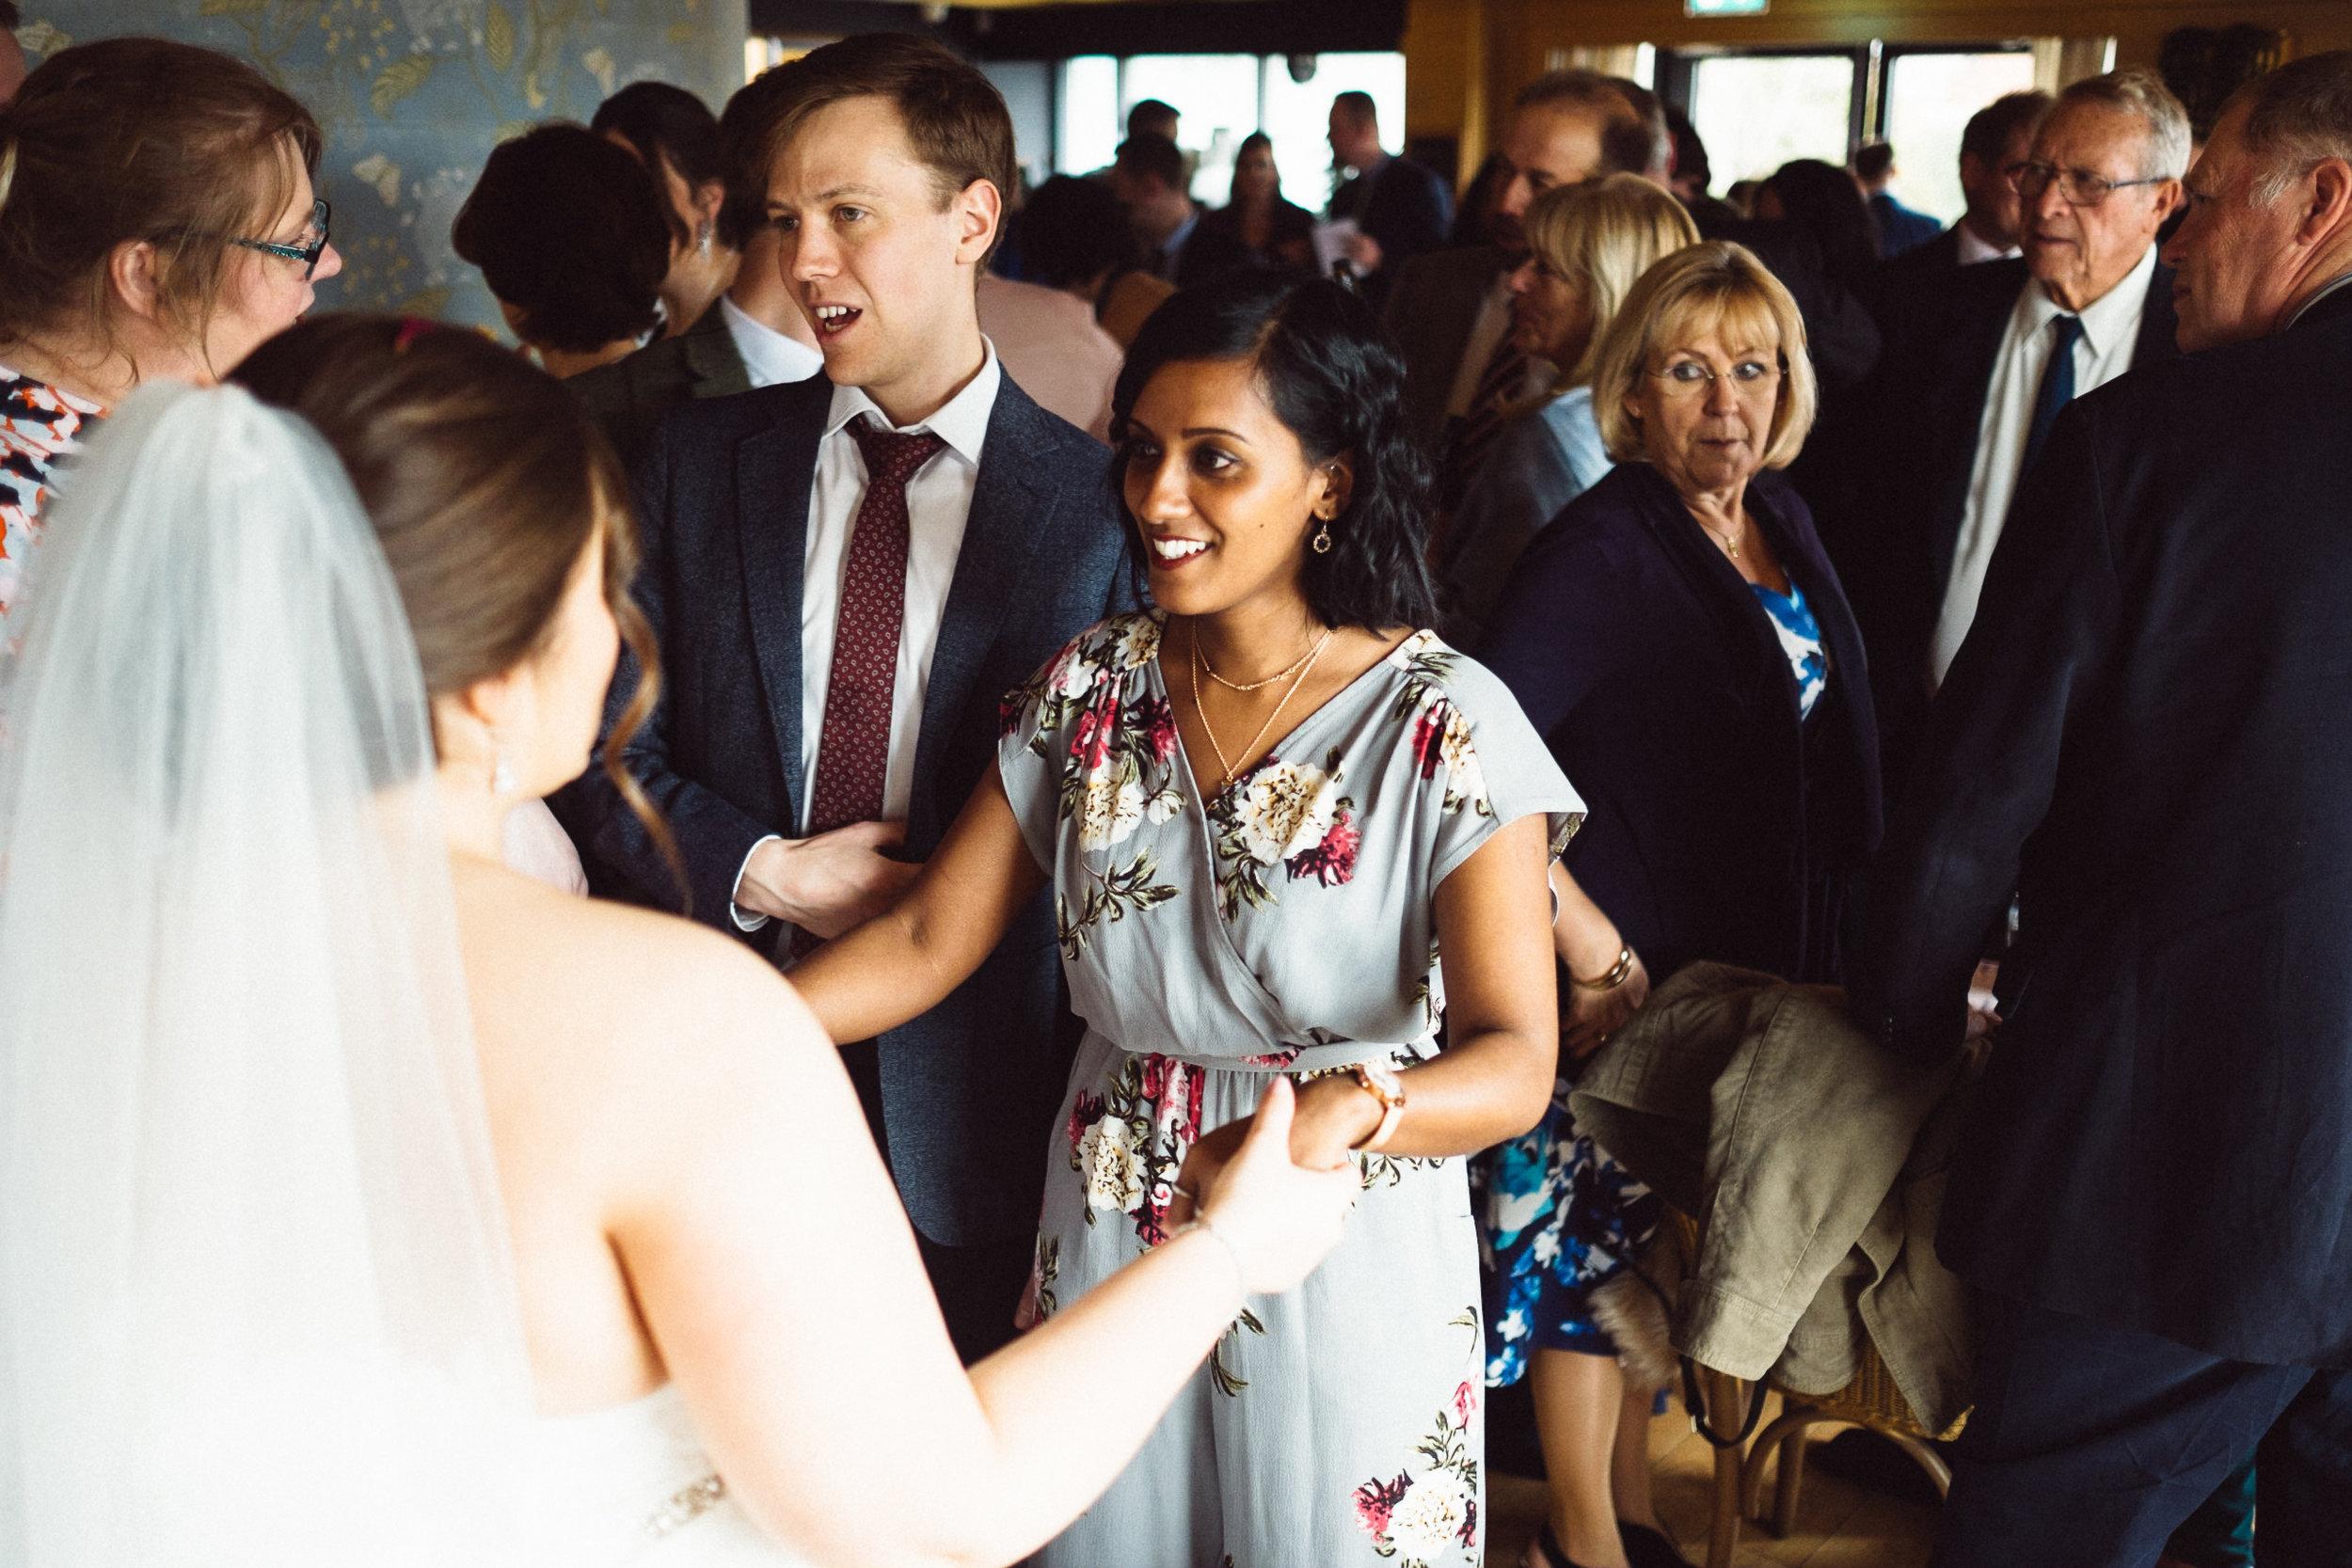 Hereford_wedding_photographer41.jpg